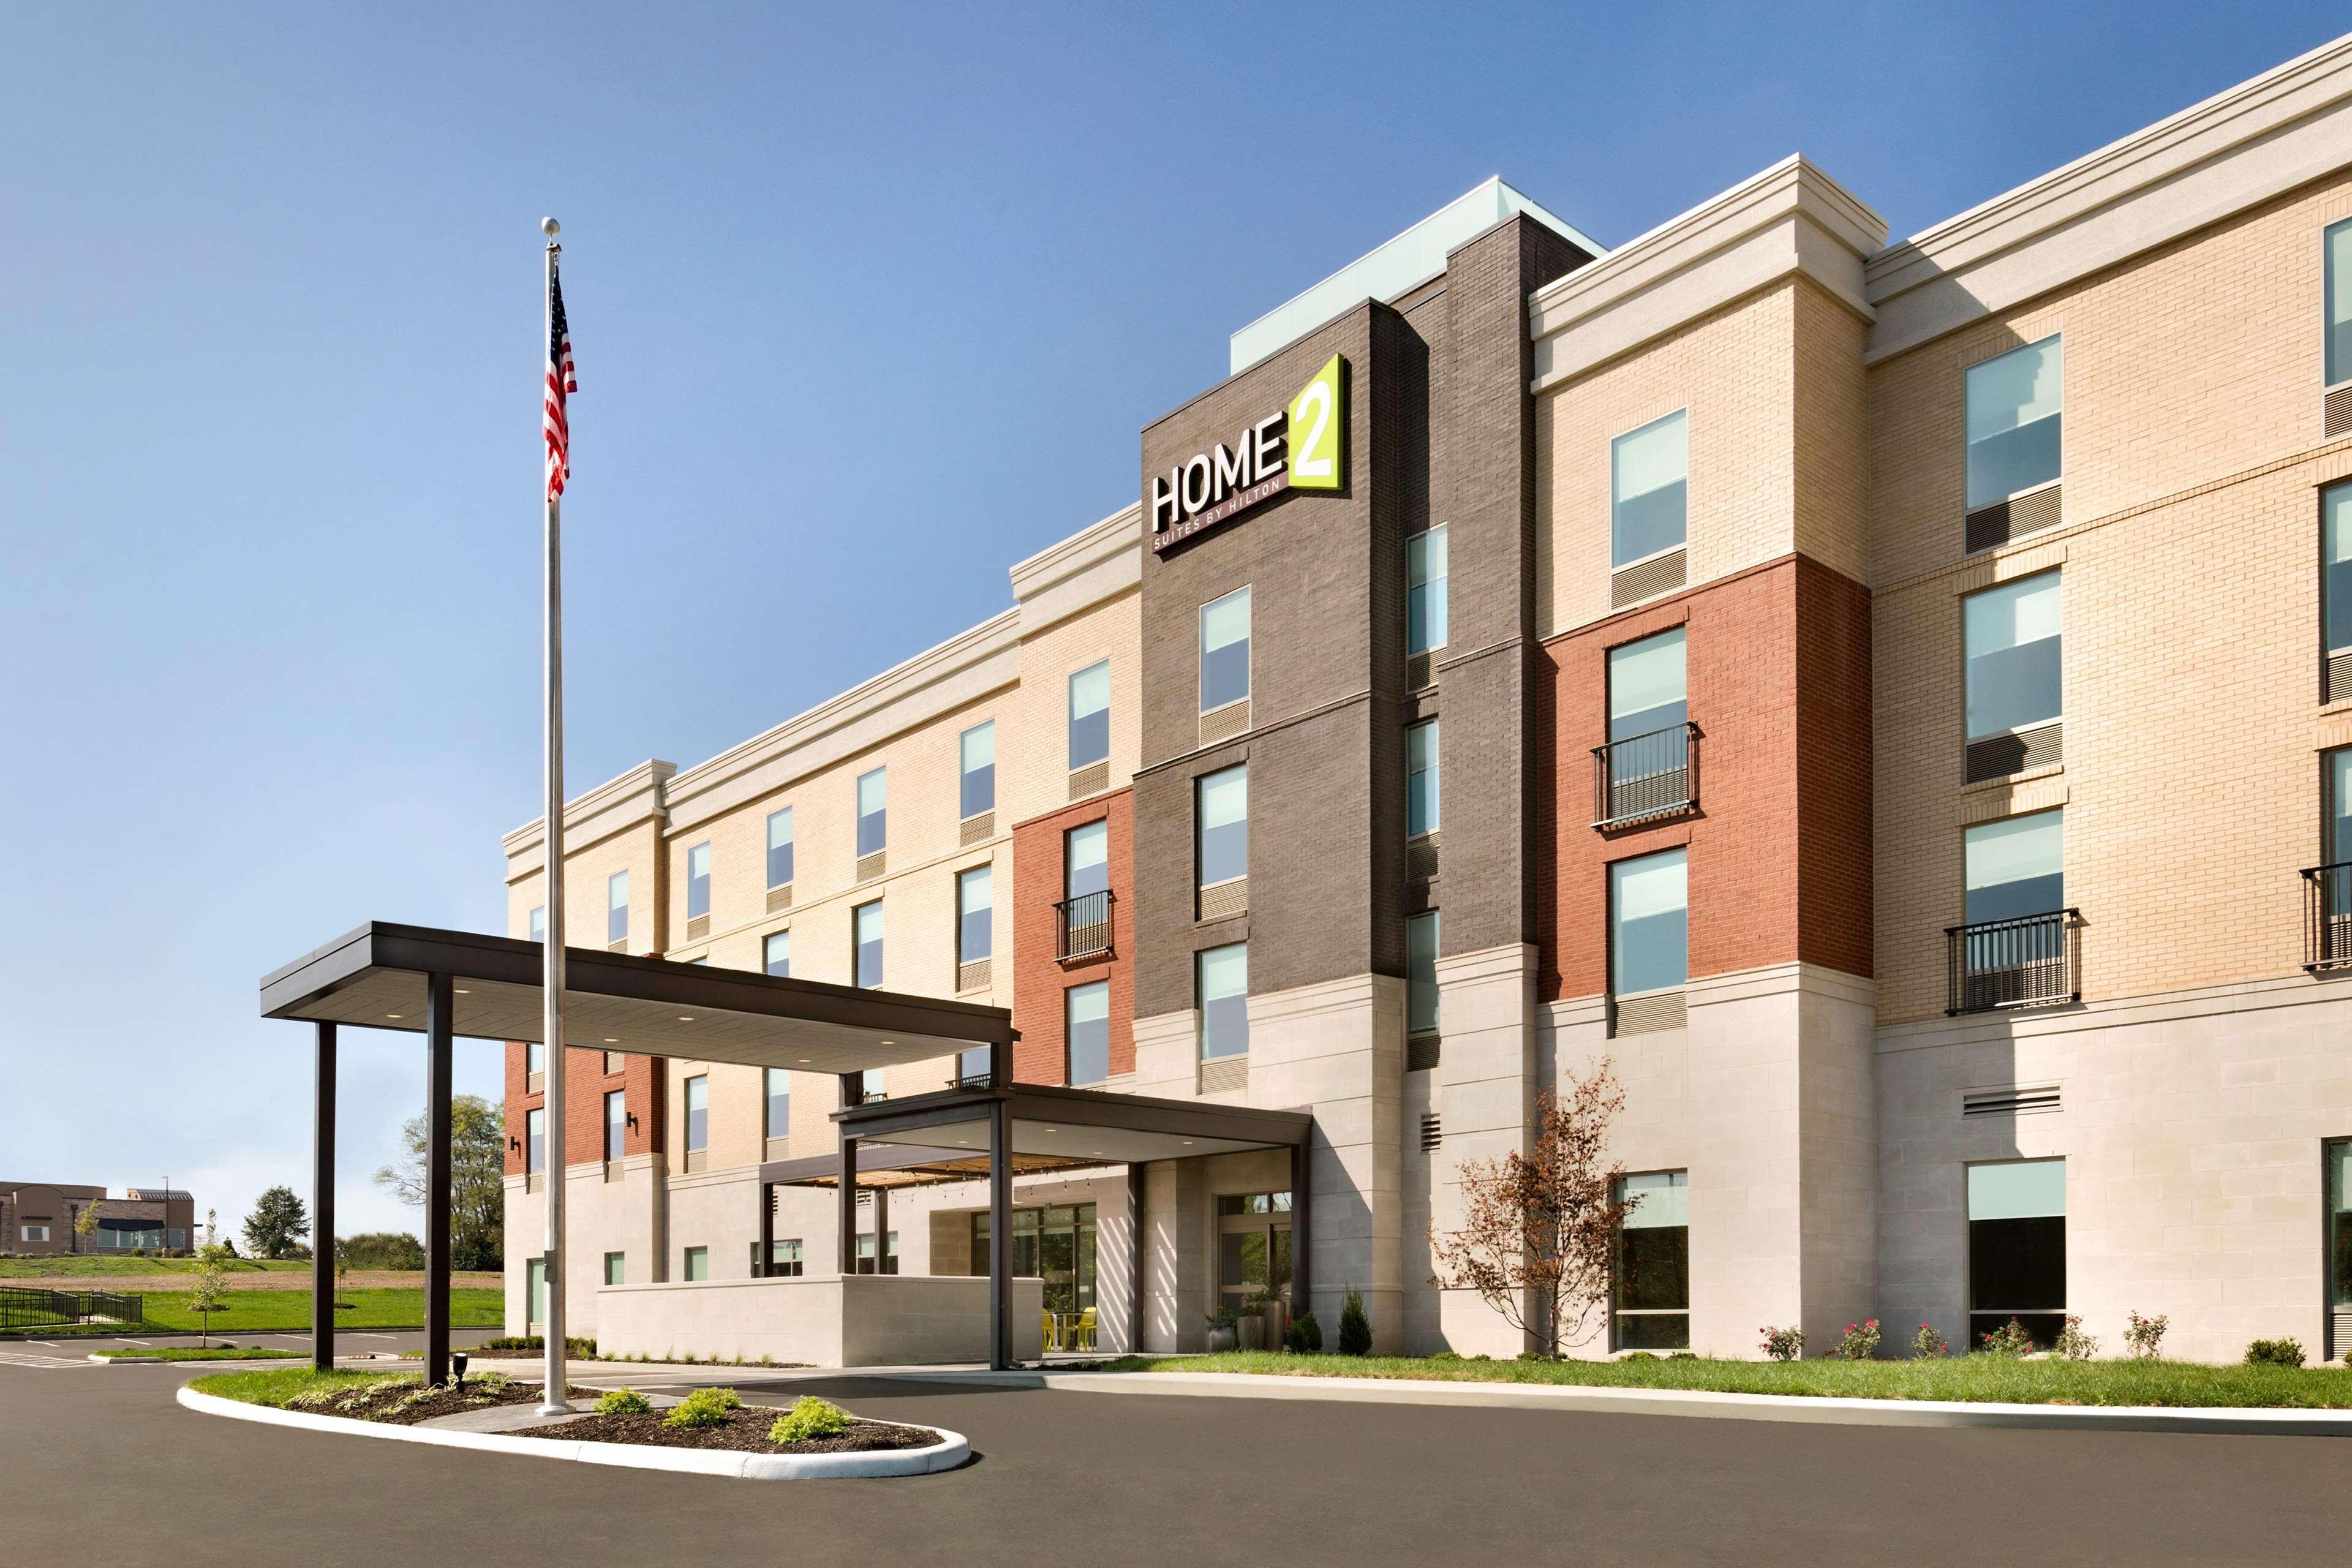 Home2 Suites by Hilton Florence Cincinnati Airport South image 0